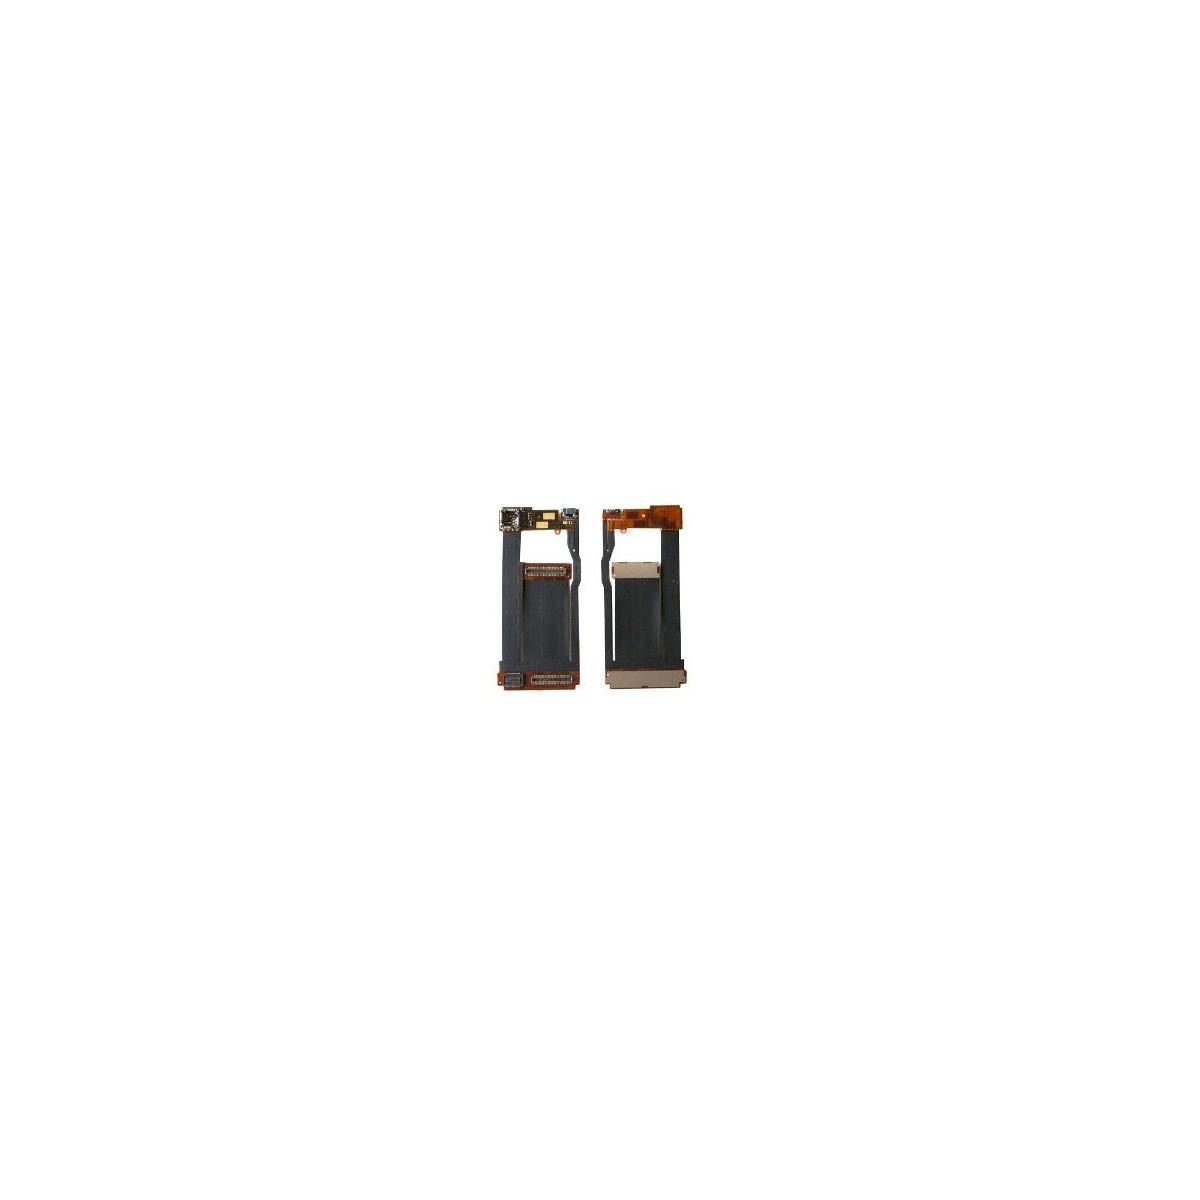 Nokia 6280, 6288 cable flex